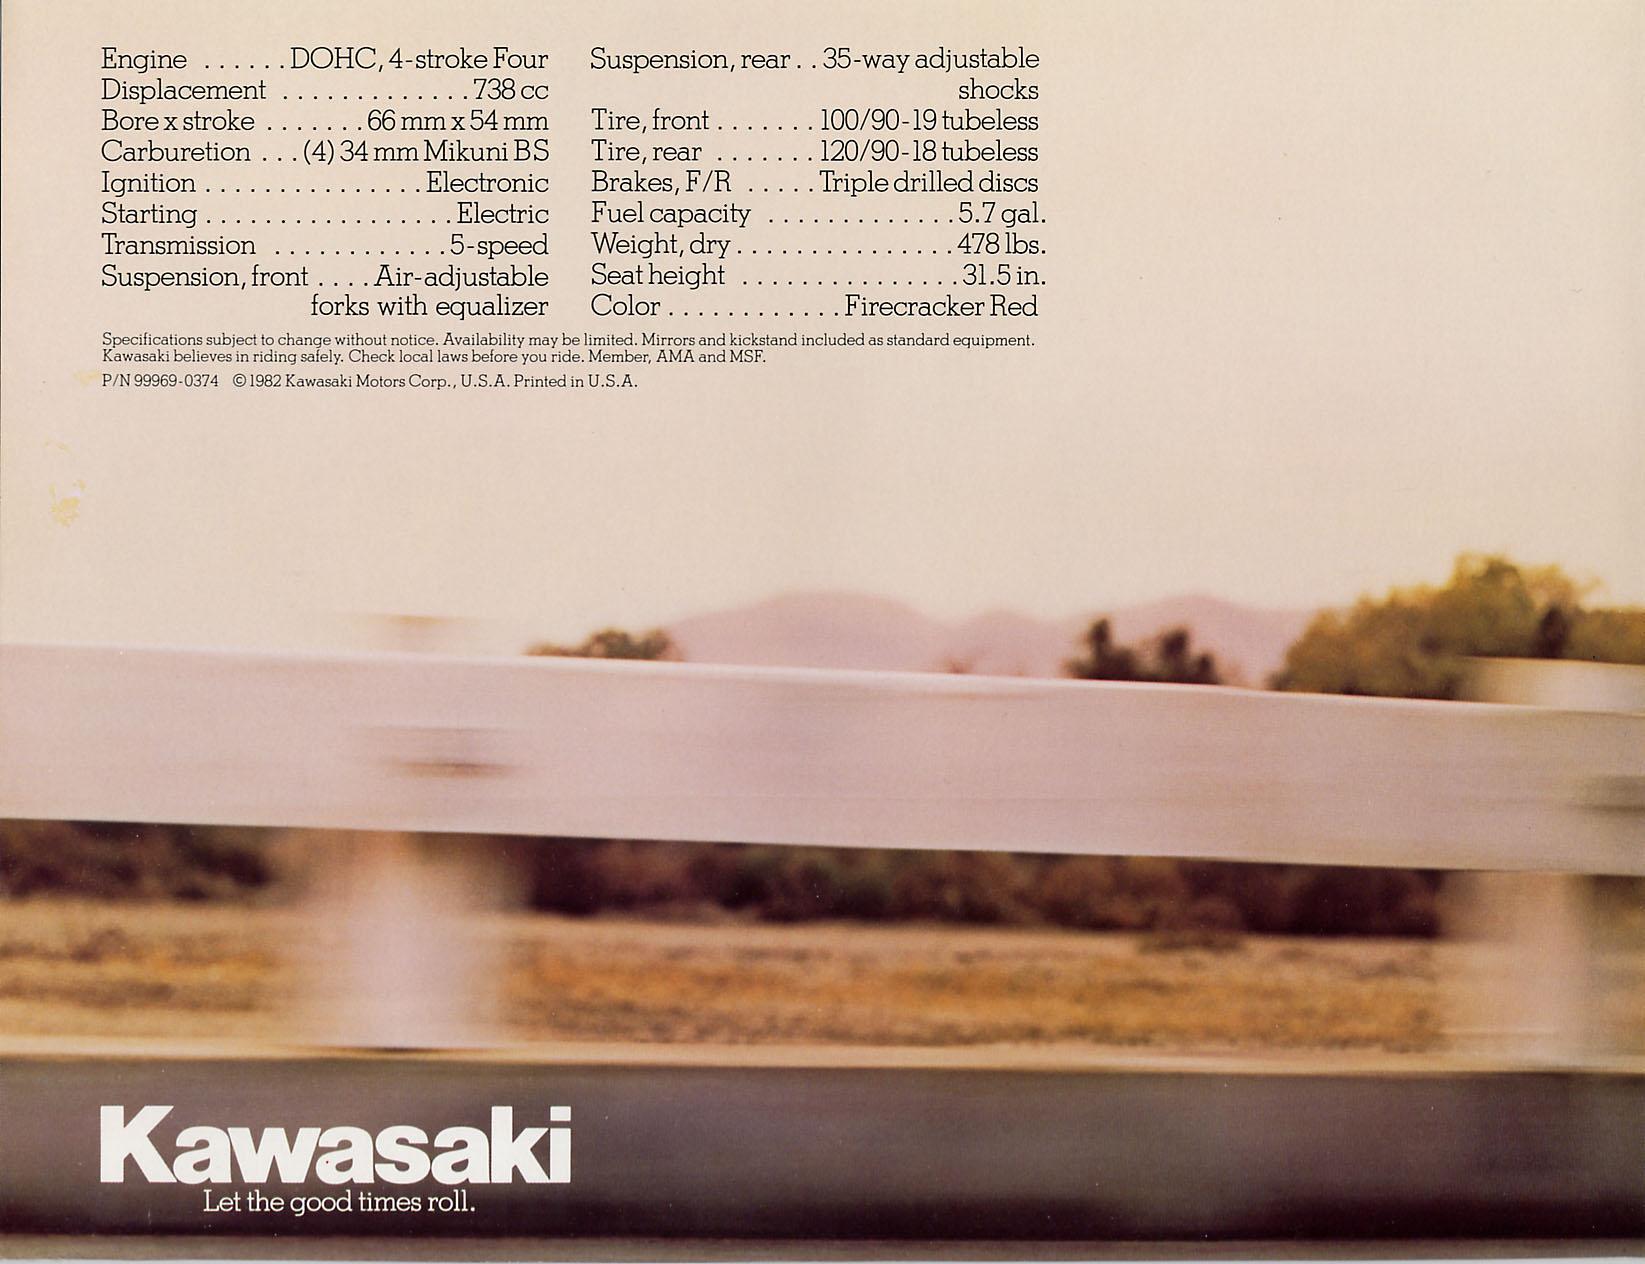 kawa GPZ750 US brochure B.JPG